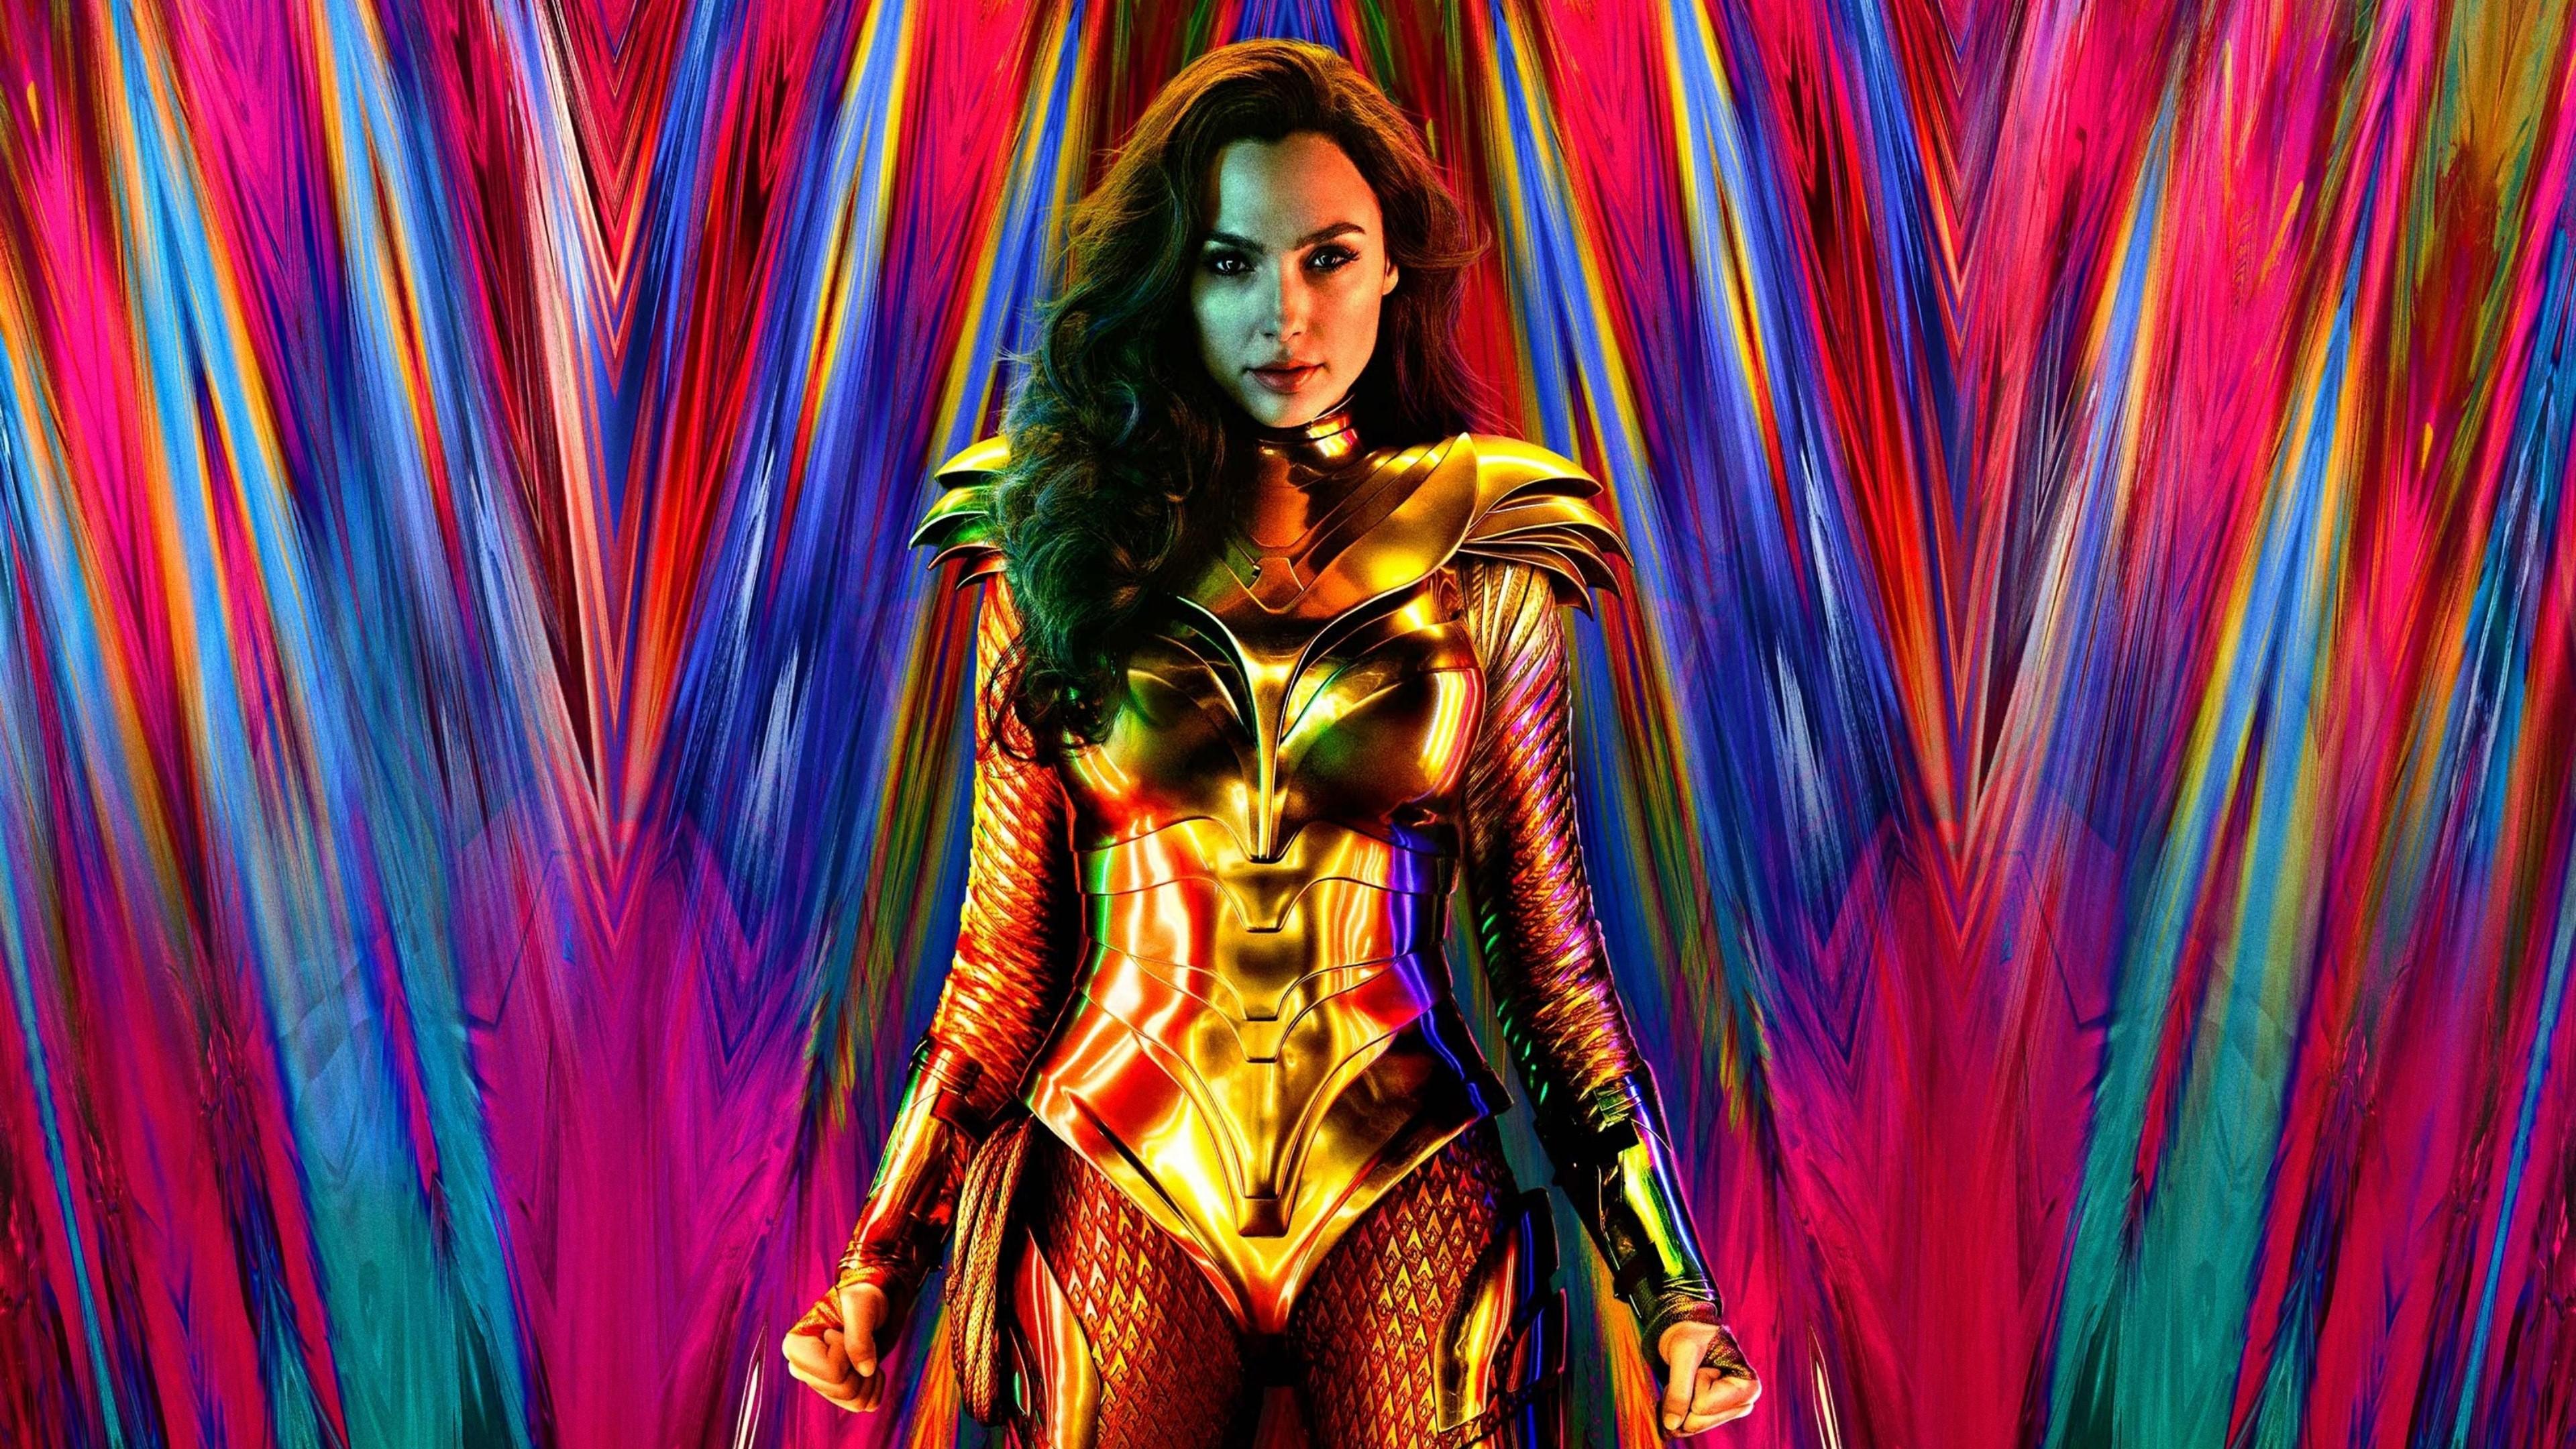 2019 Movie Wonder Woman 1984 Gal Gadot Art Wallpaper 4000x2795